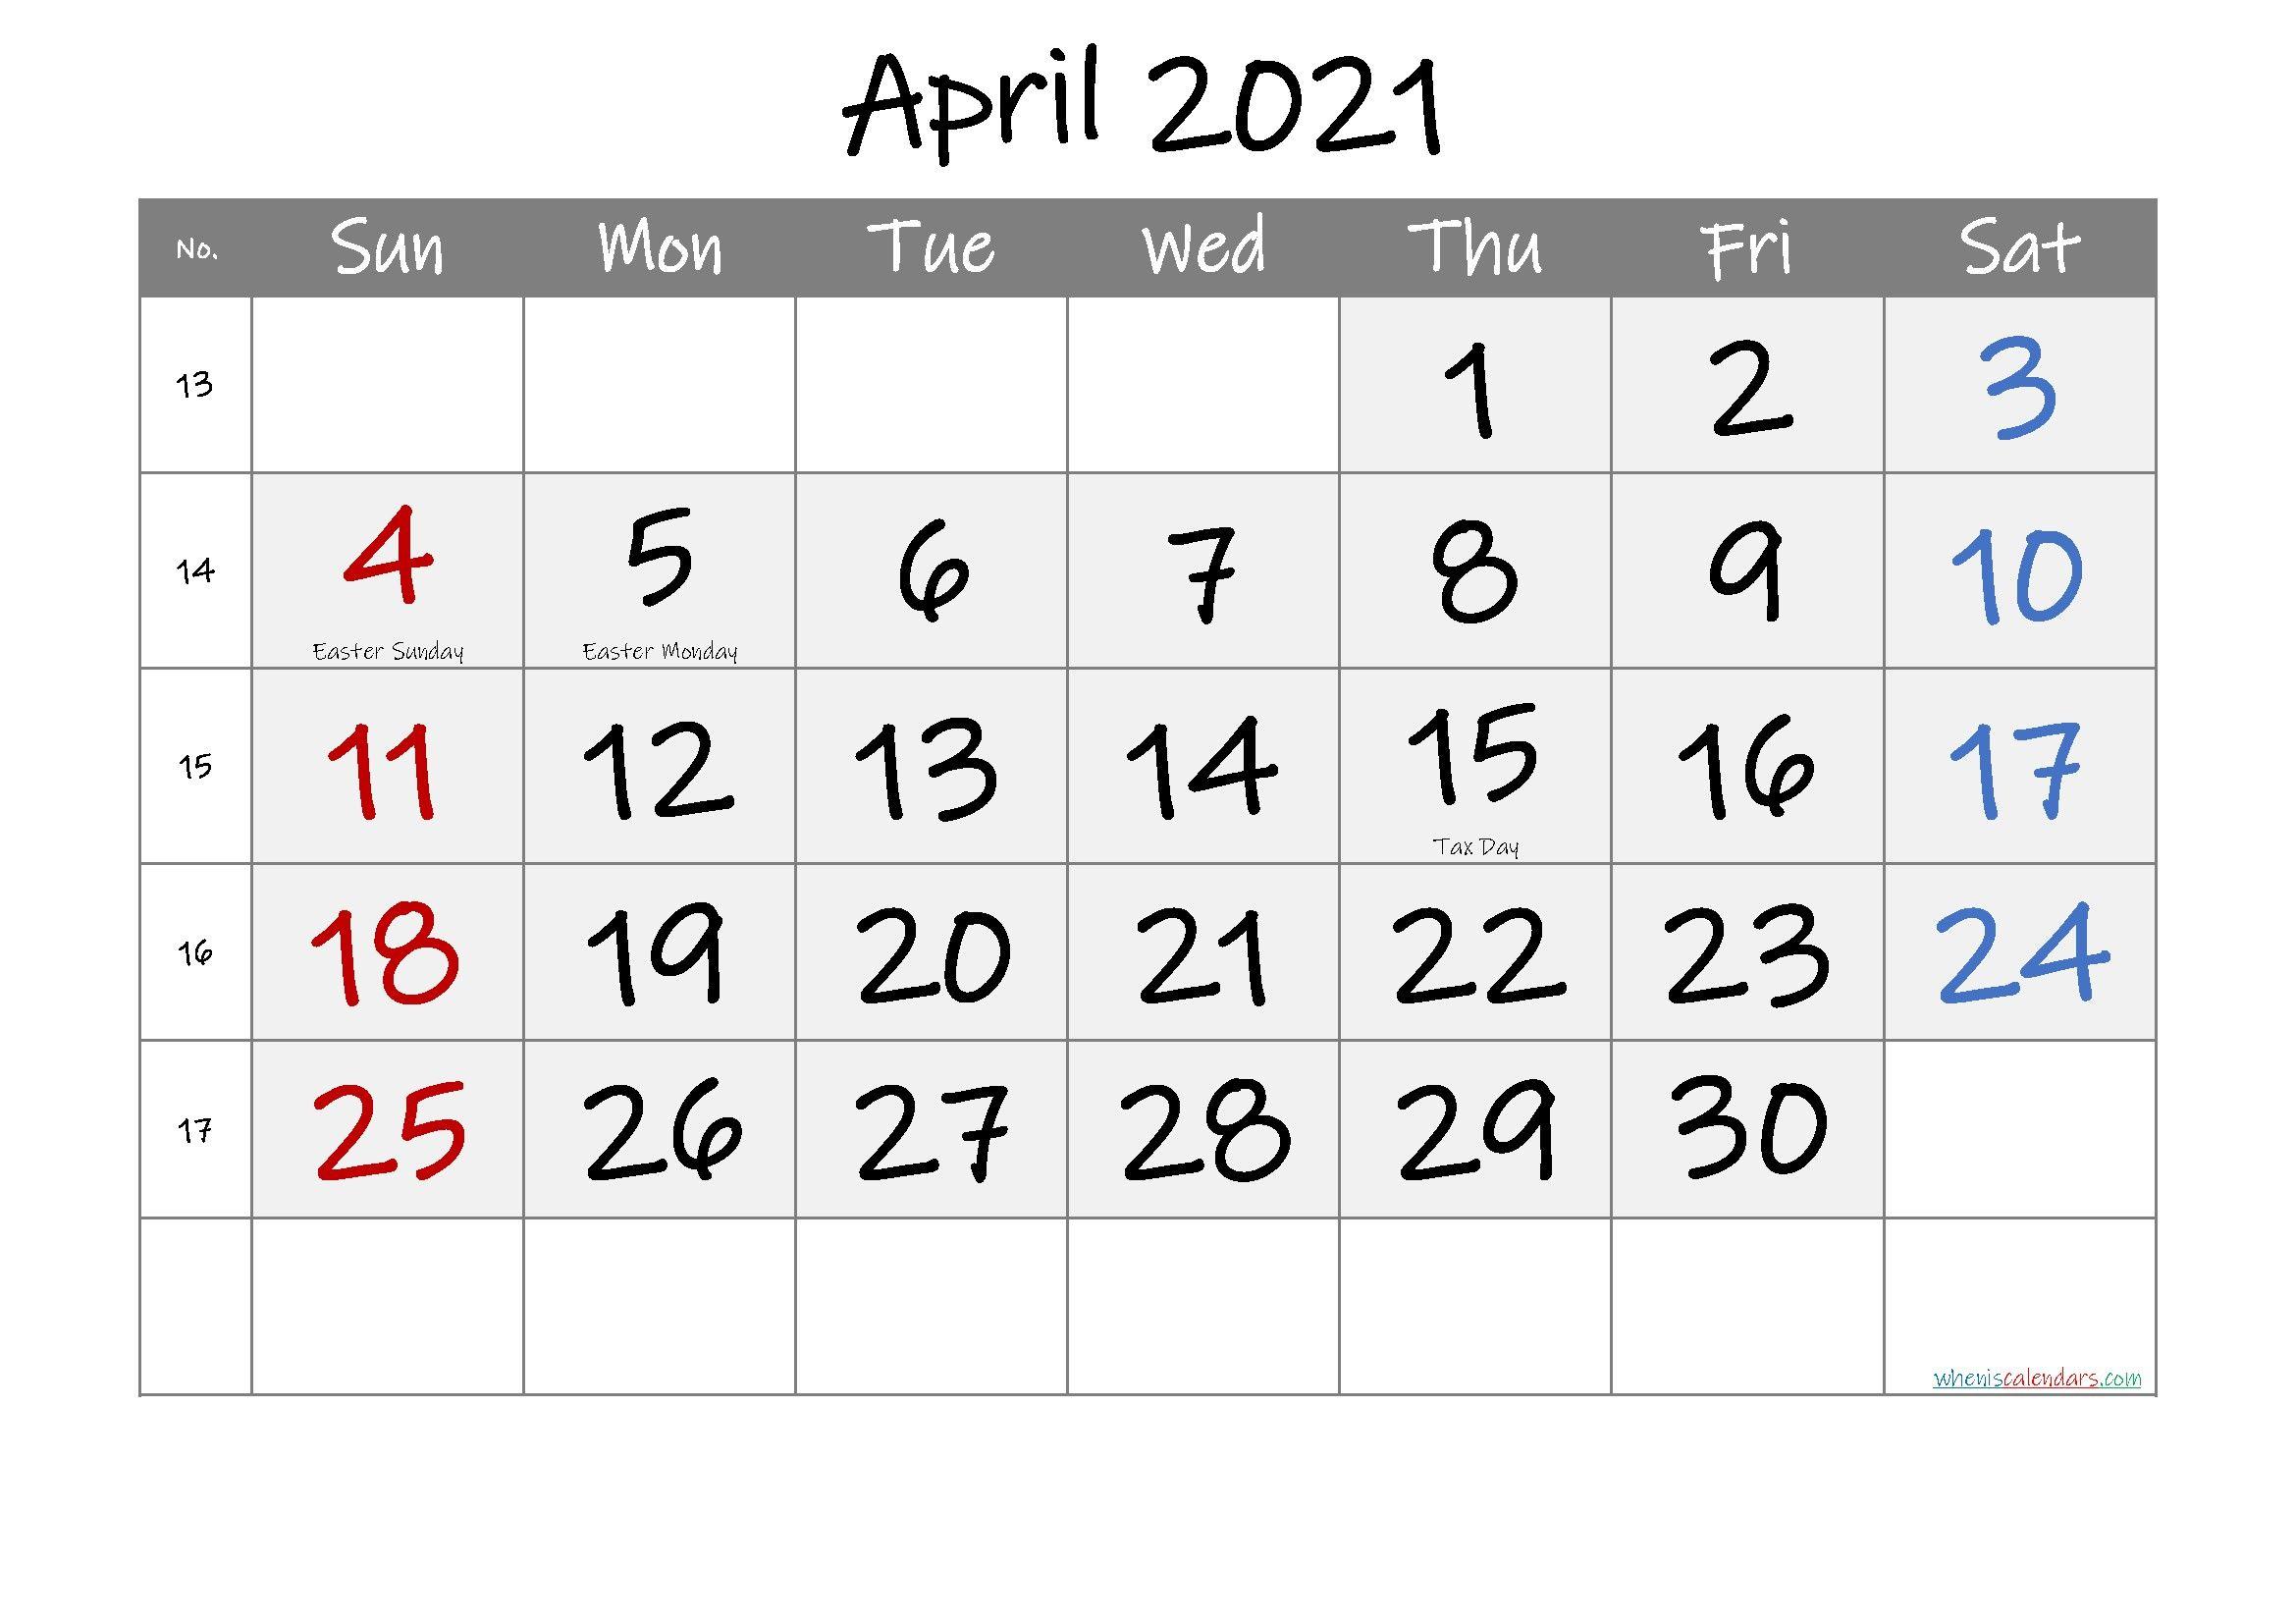 January To April 2021 Calendar In 2020 | Calendar Printables